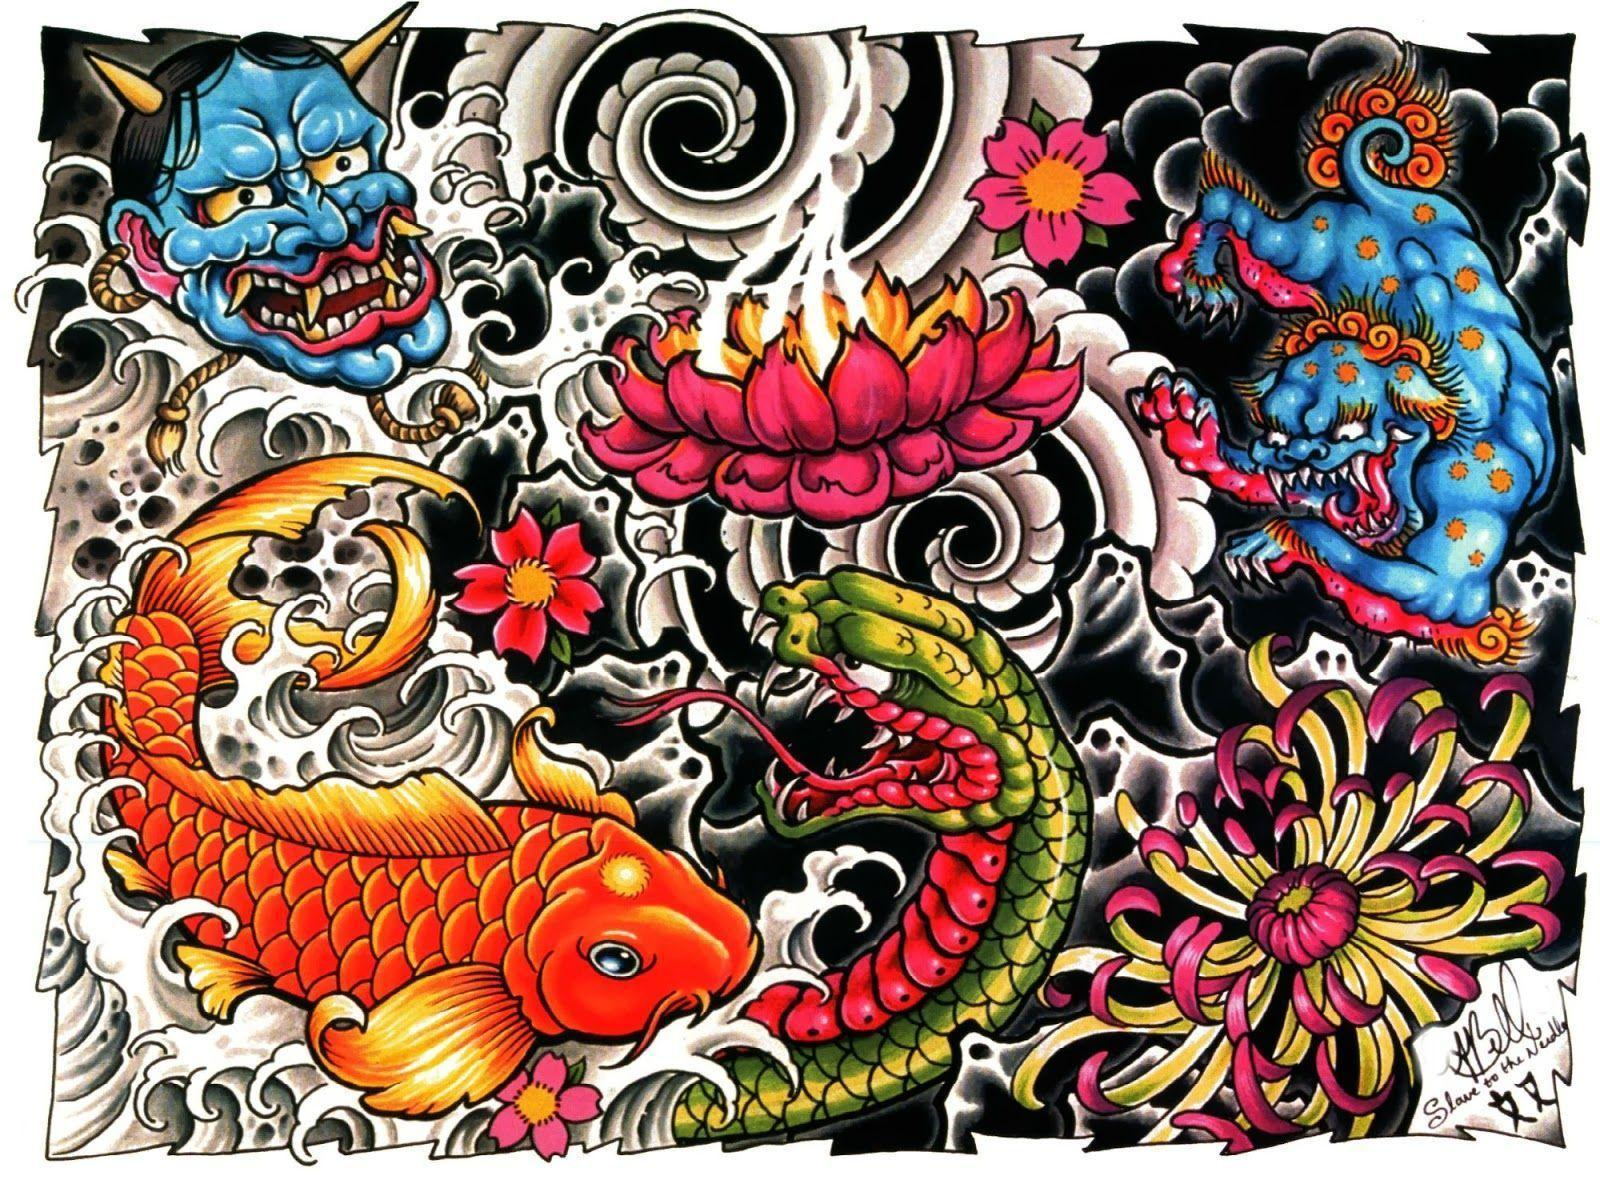 Tattoo Design Wallpapers Top Free Tattoo Design Backgrounds Wallpaperaccess